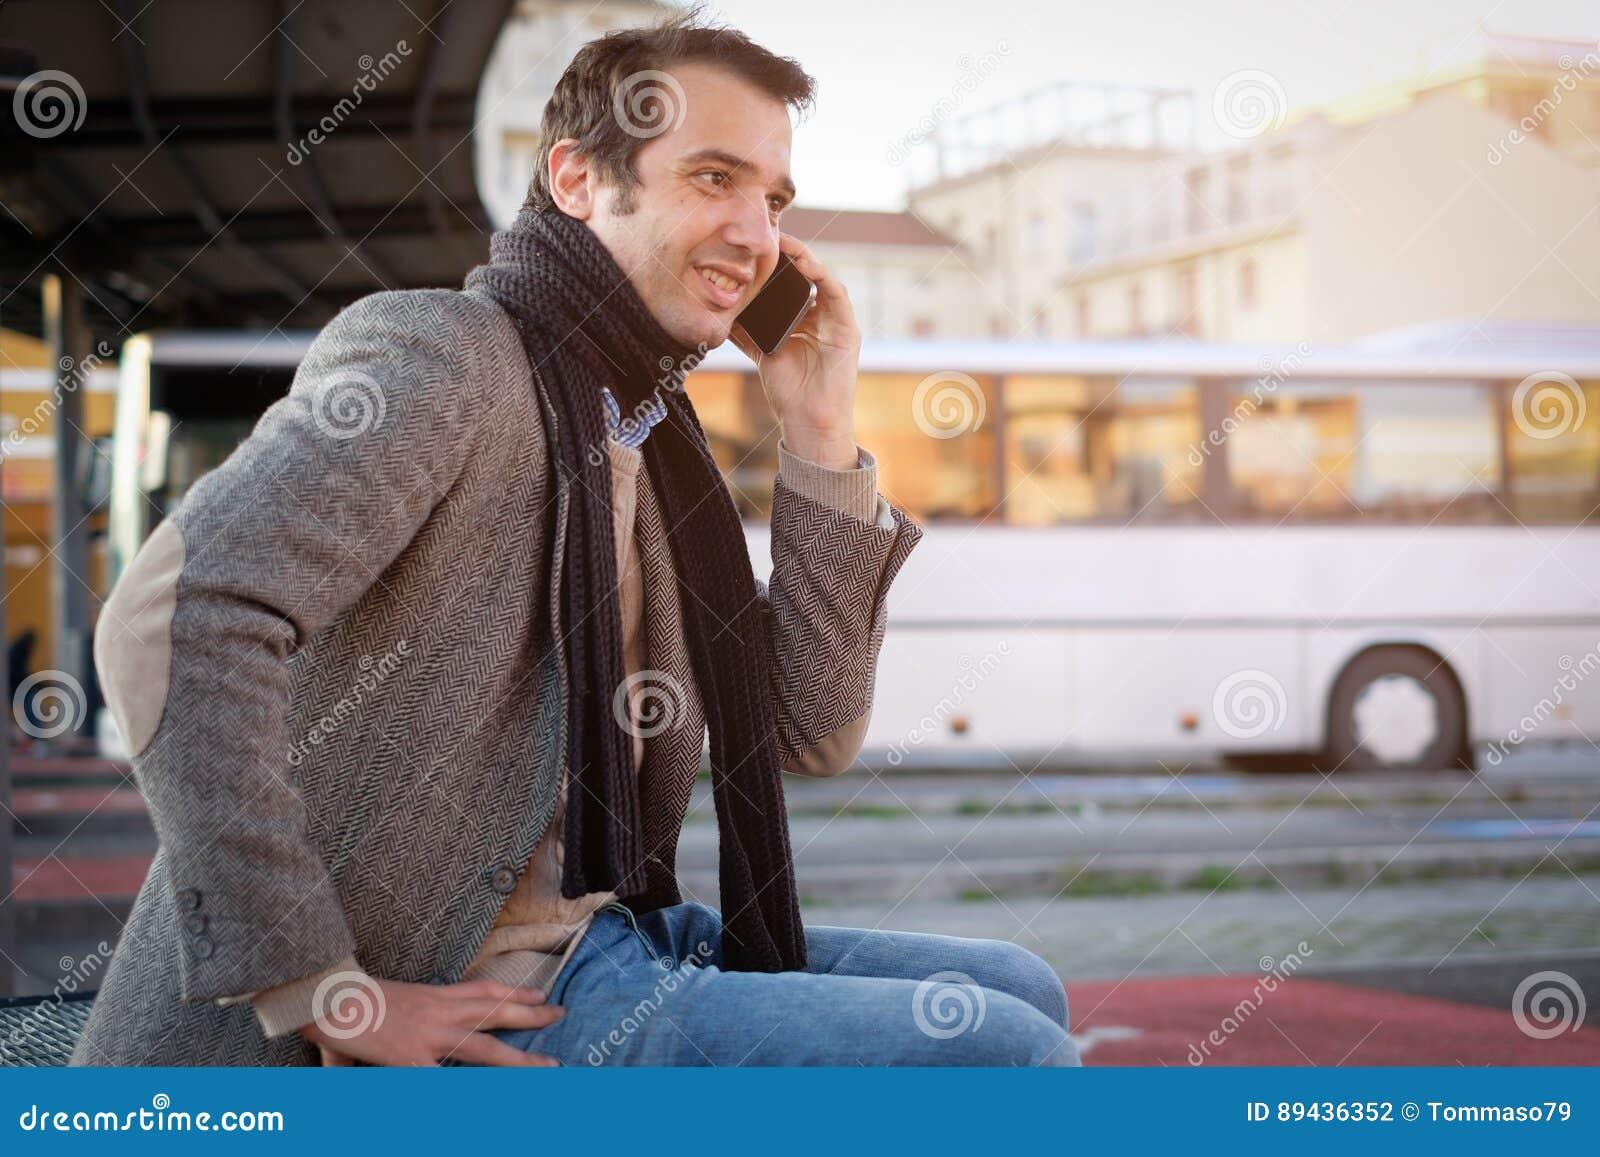 Man waiting at the bus station and talking